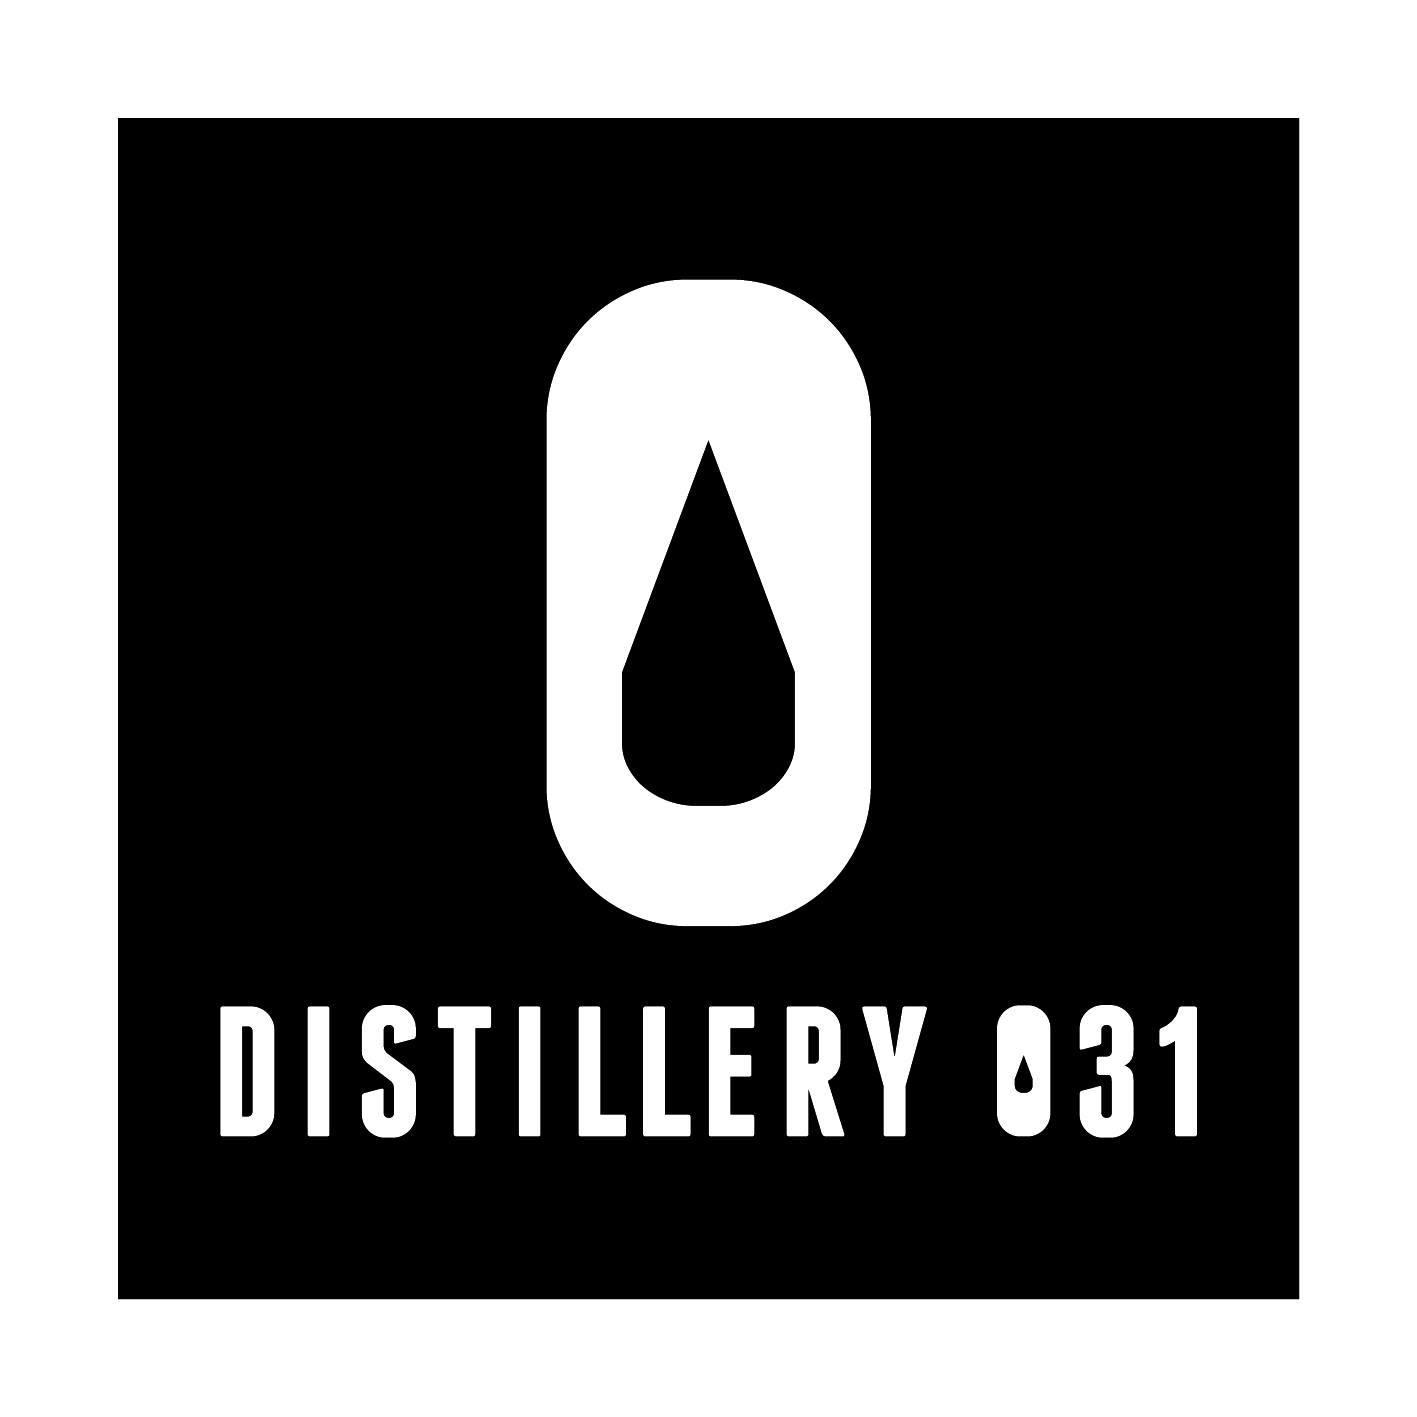 Distellery 031